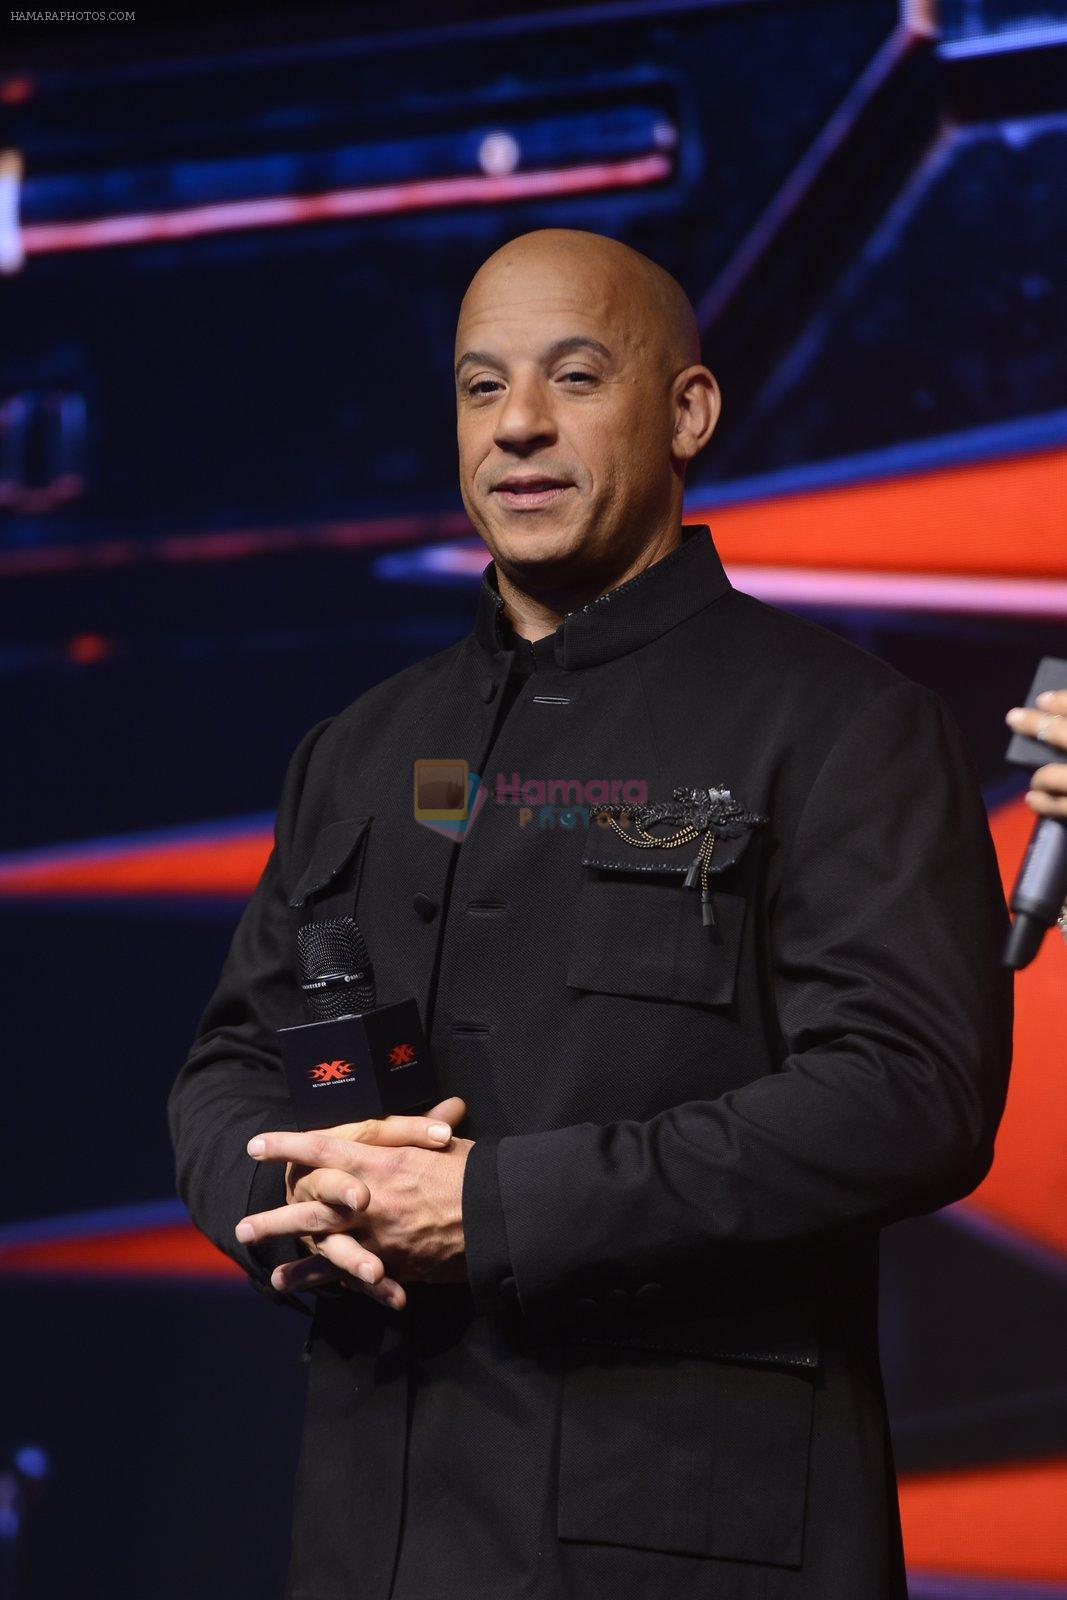 Vin Diesel at XXX Press Meet on 12th Jan 2017 / Vin Diesel - Bollywood Photos